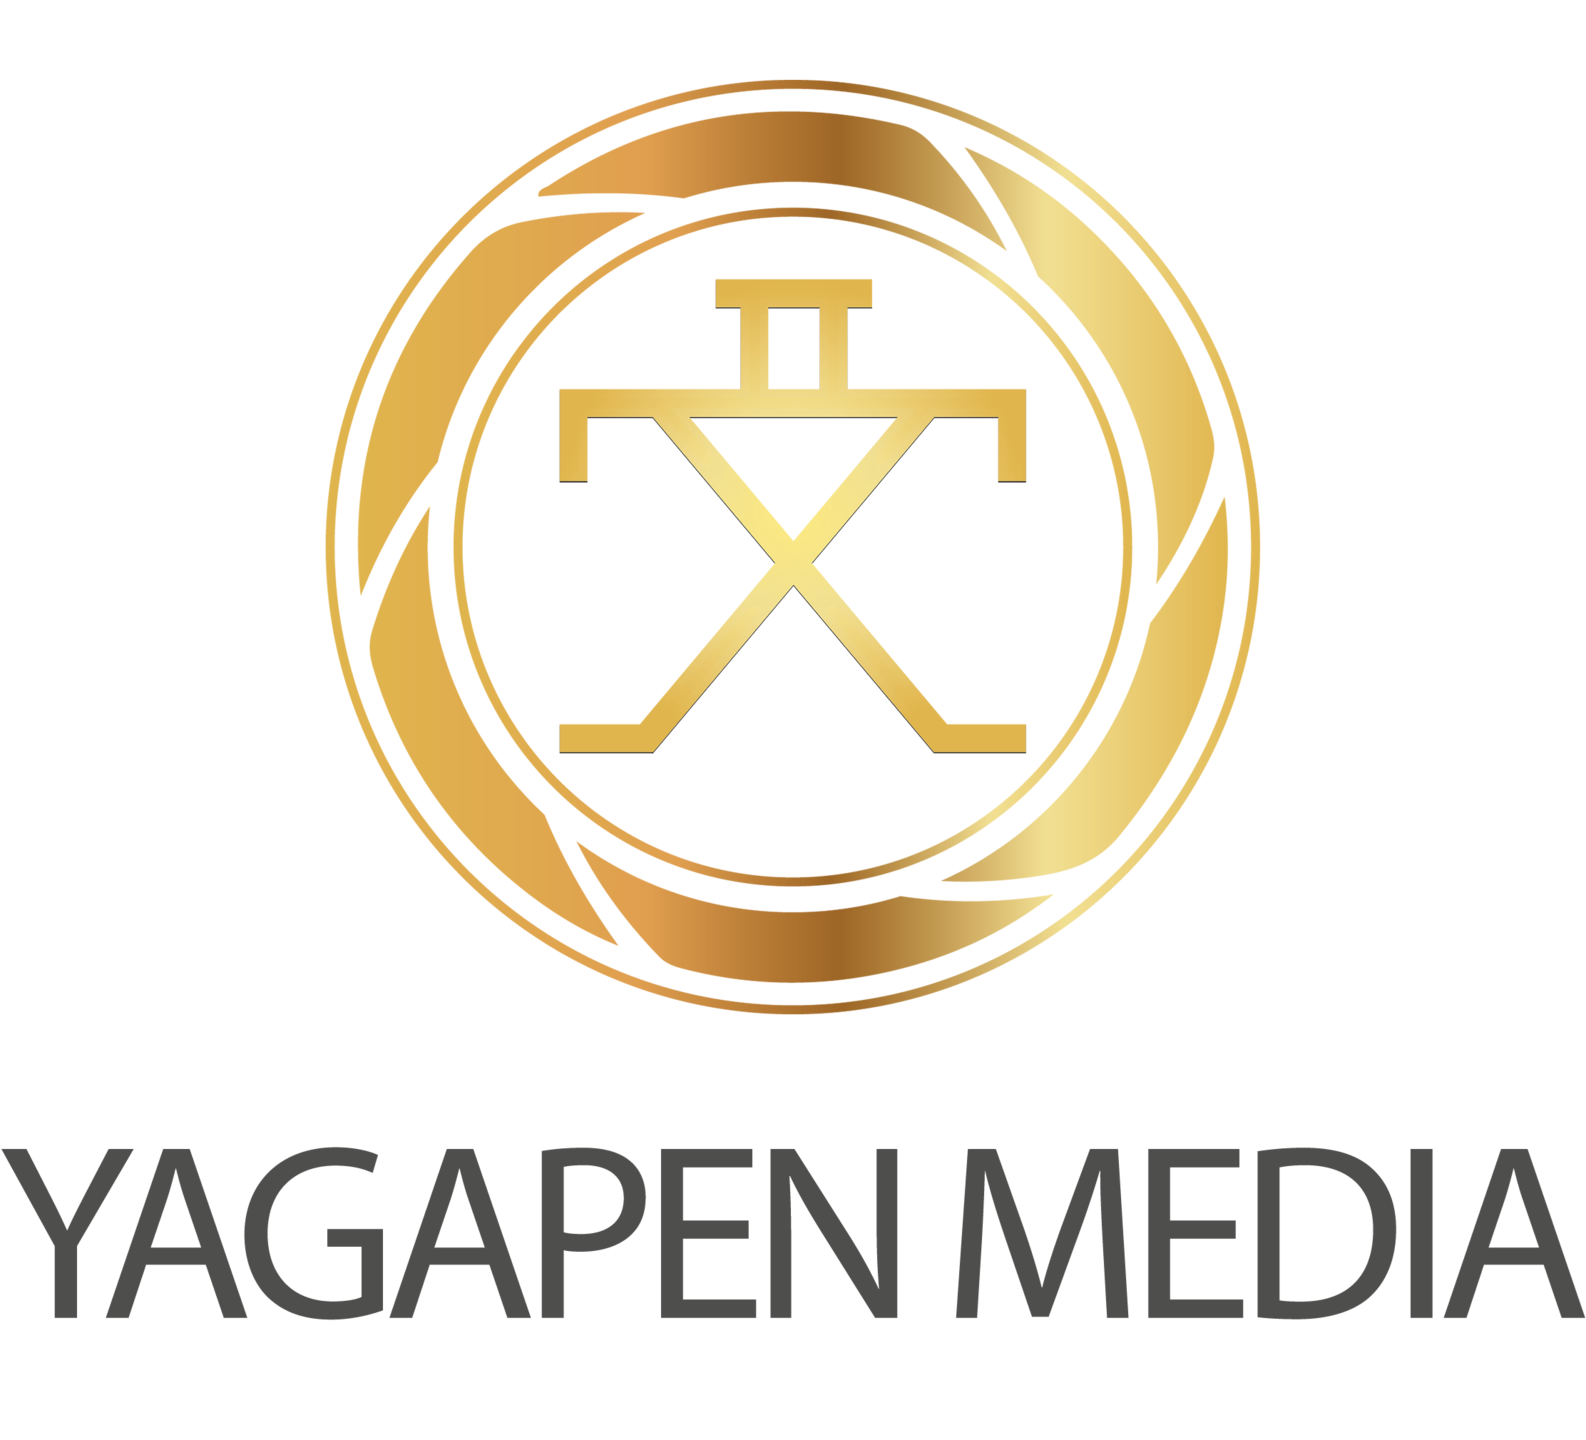 YAGAPEN MEDIA